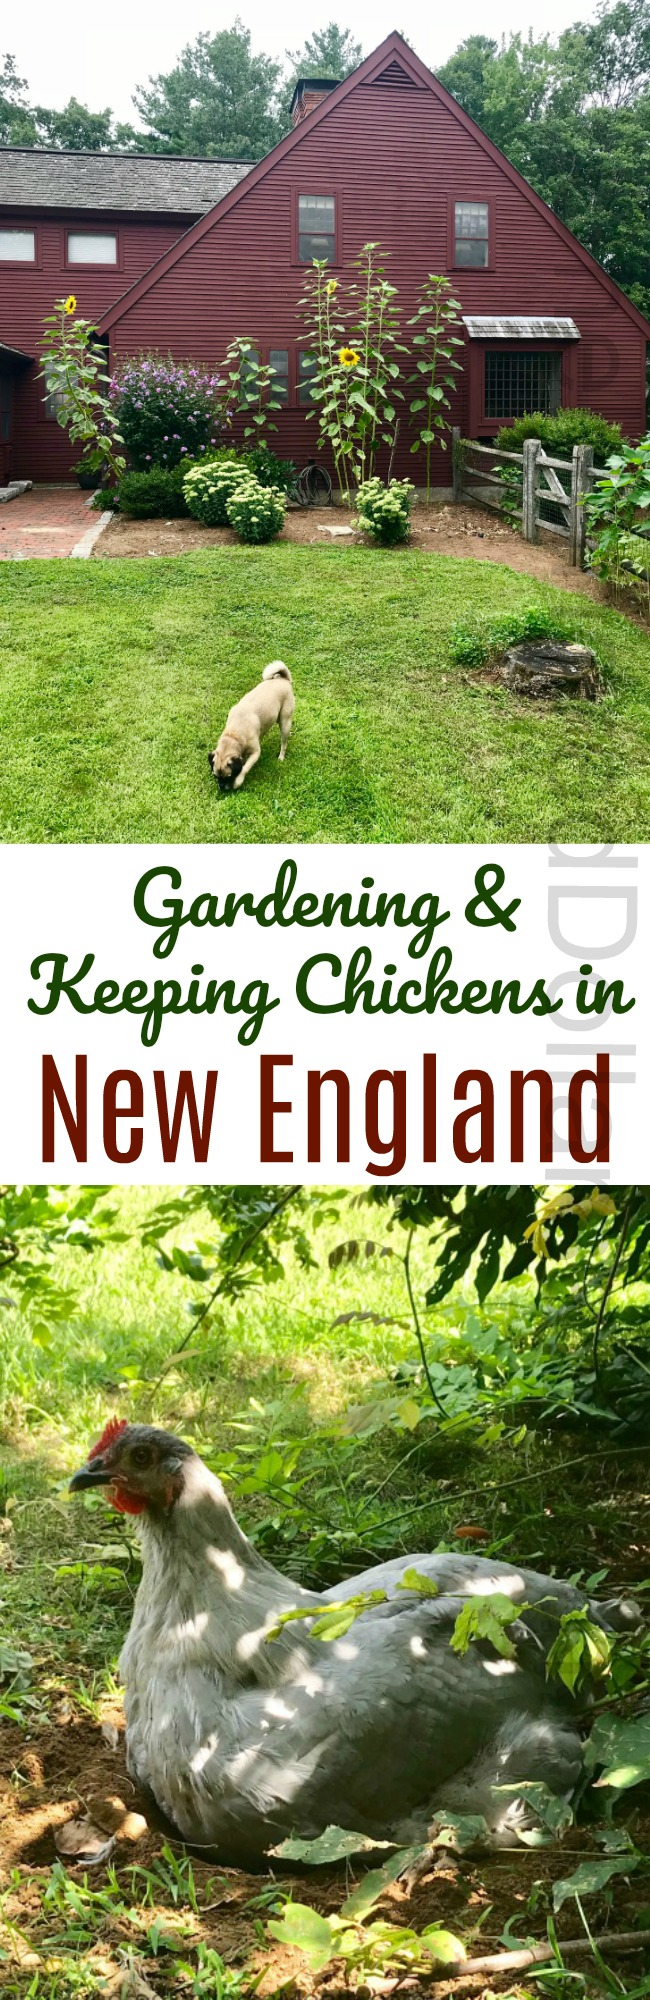 Gardening in New England - An Update on the Chicken Run ...